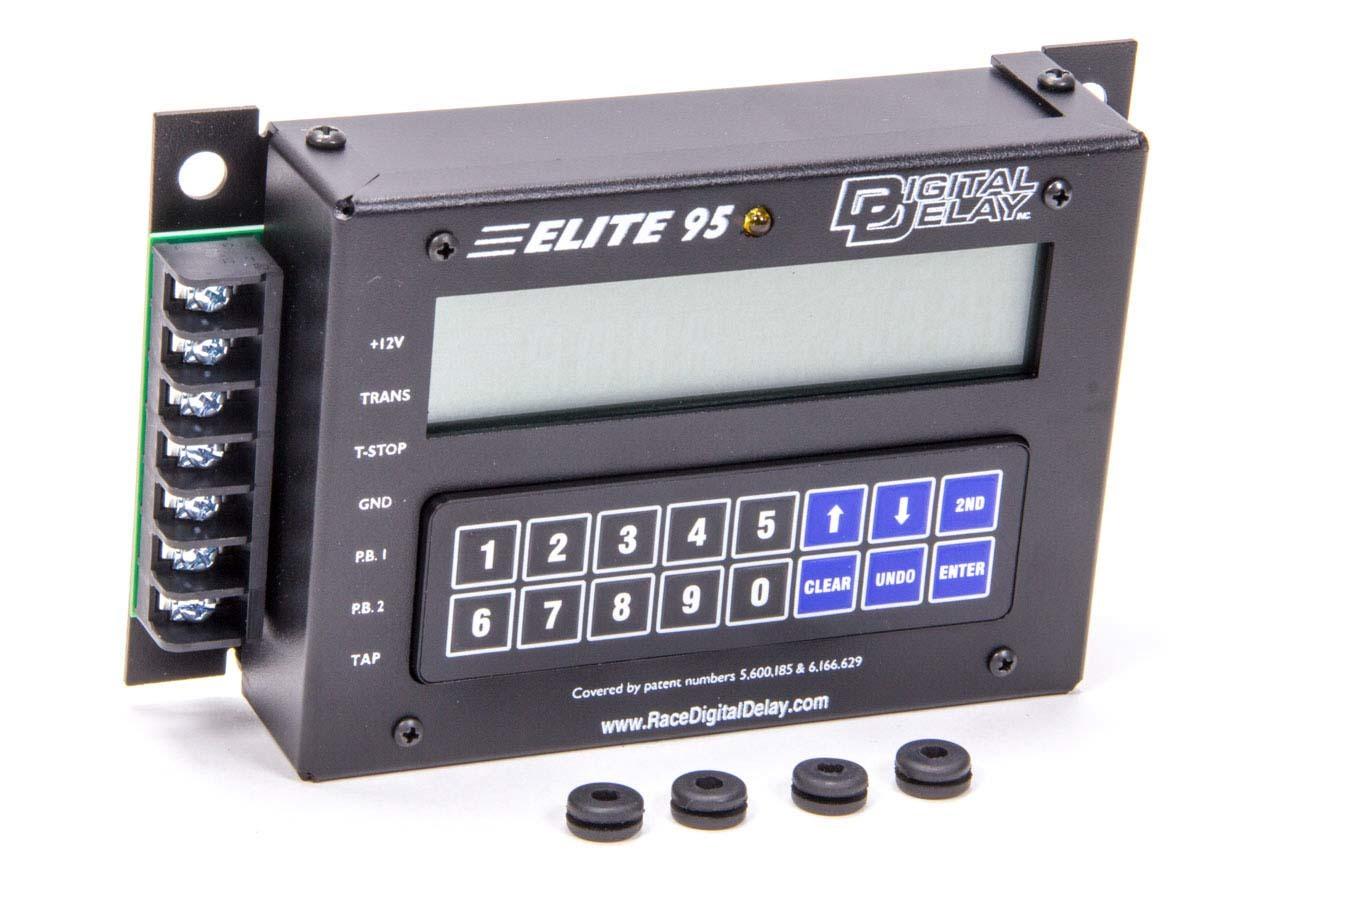 Biondo Racing Products DDI-1041-BB Delay Box, Elite 95, Digital, Blue Illuminated, Crossover Delay, Steel, Black, Each